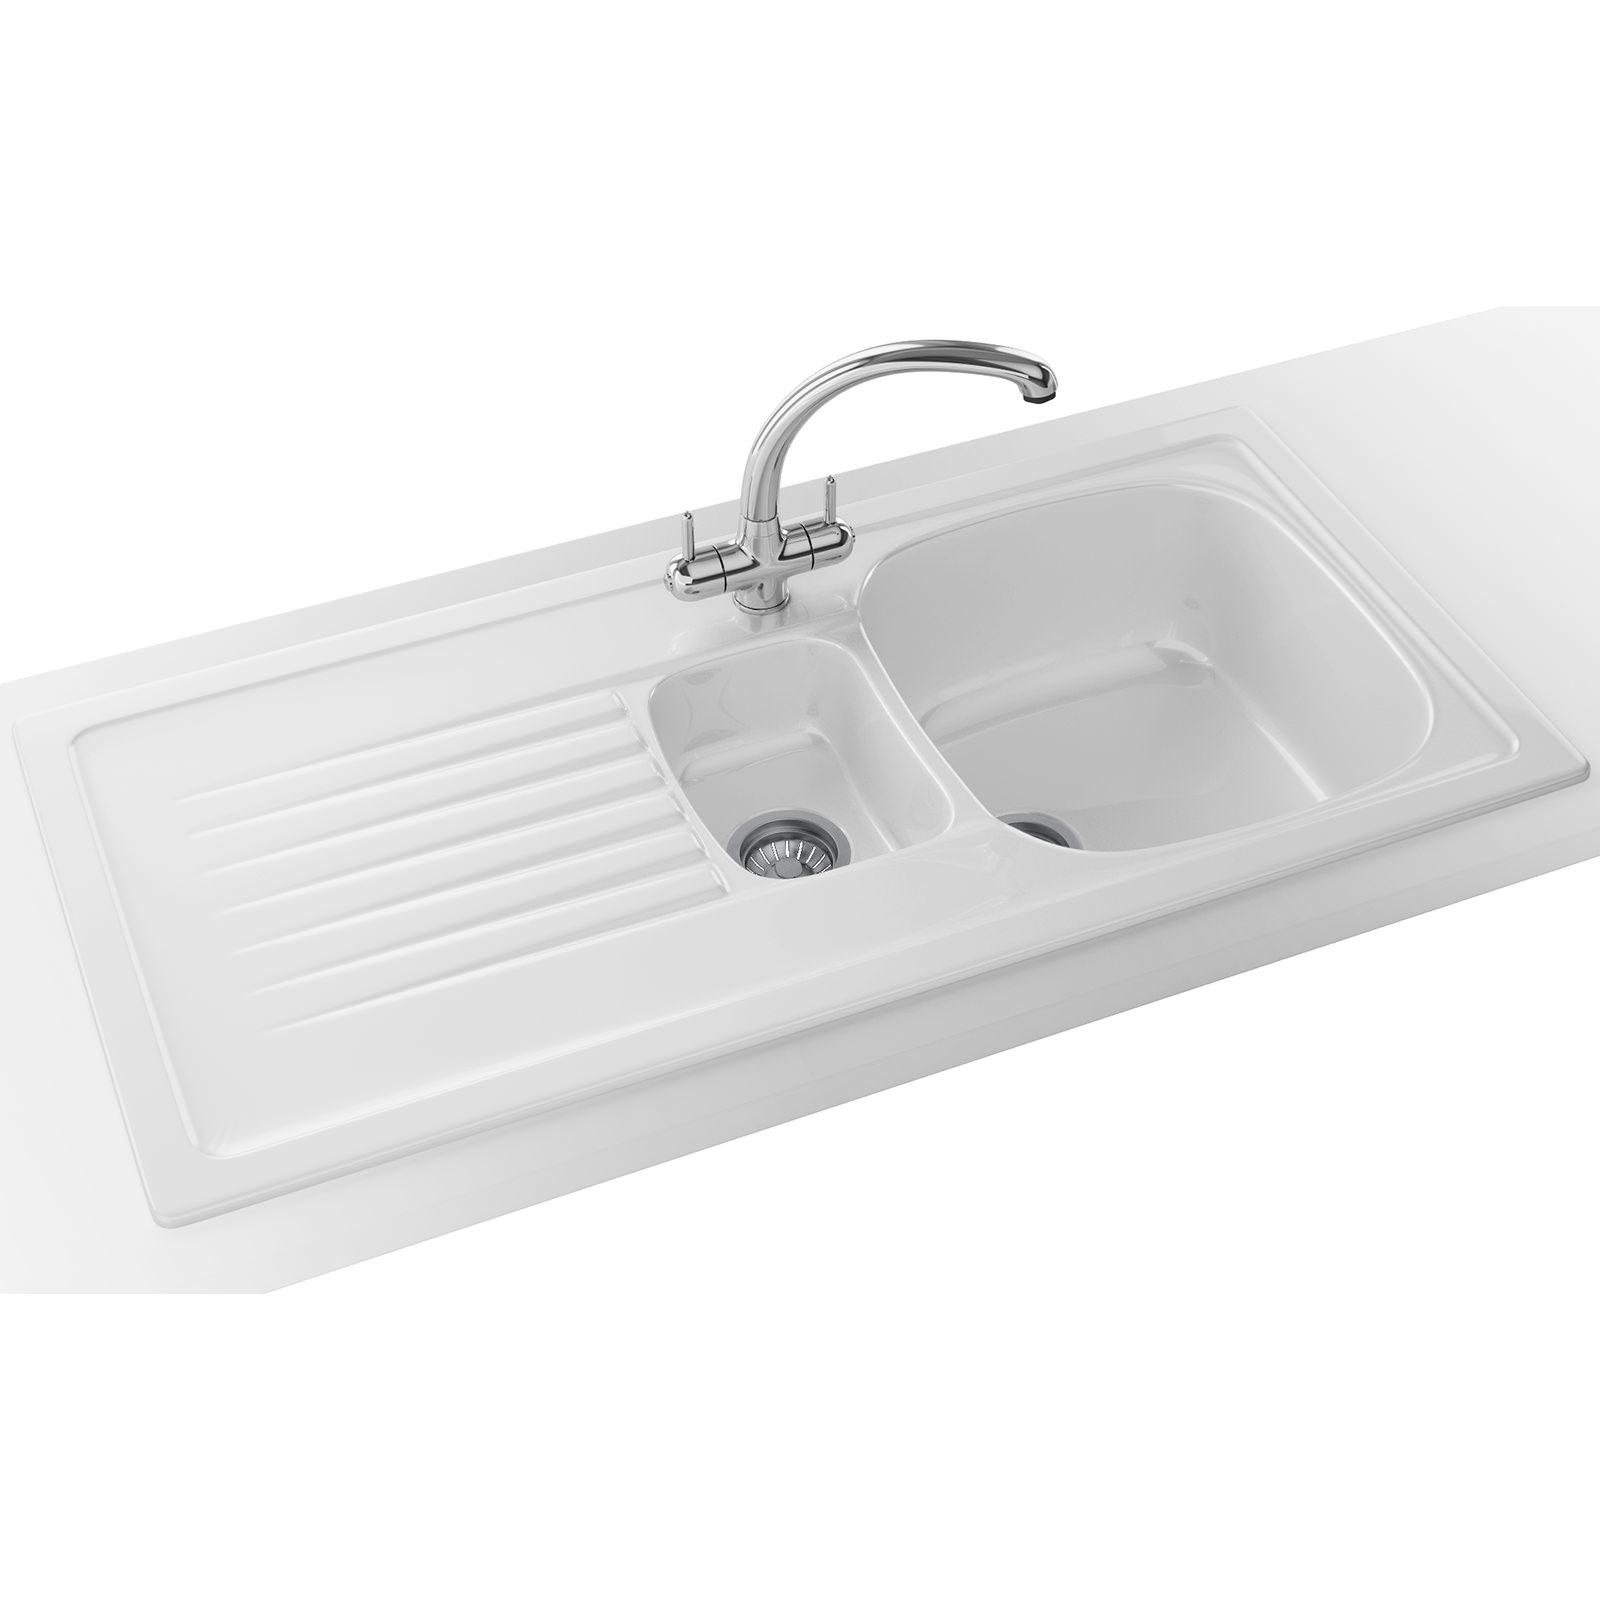 franco kitchen sinks wood top for island franke elba propack elk 651 ceramic white inset sink and